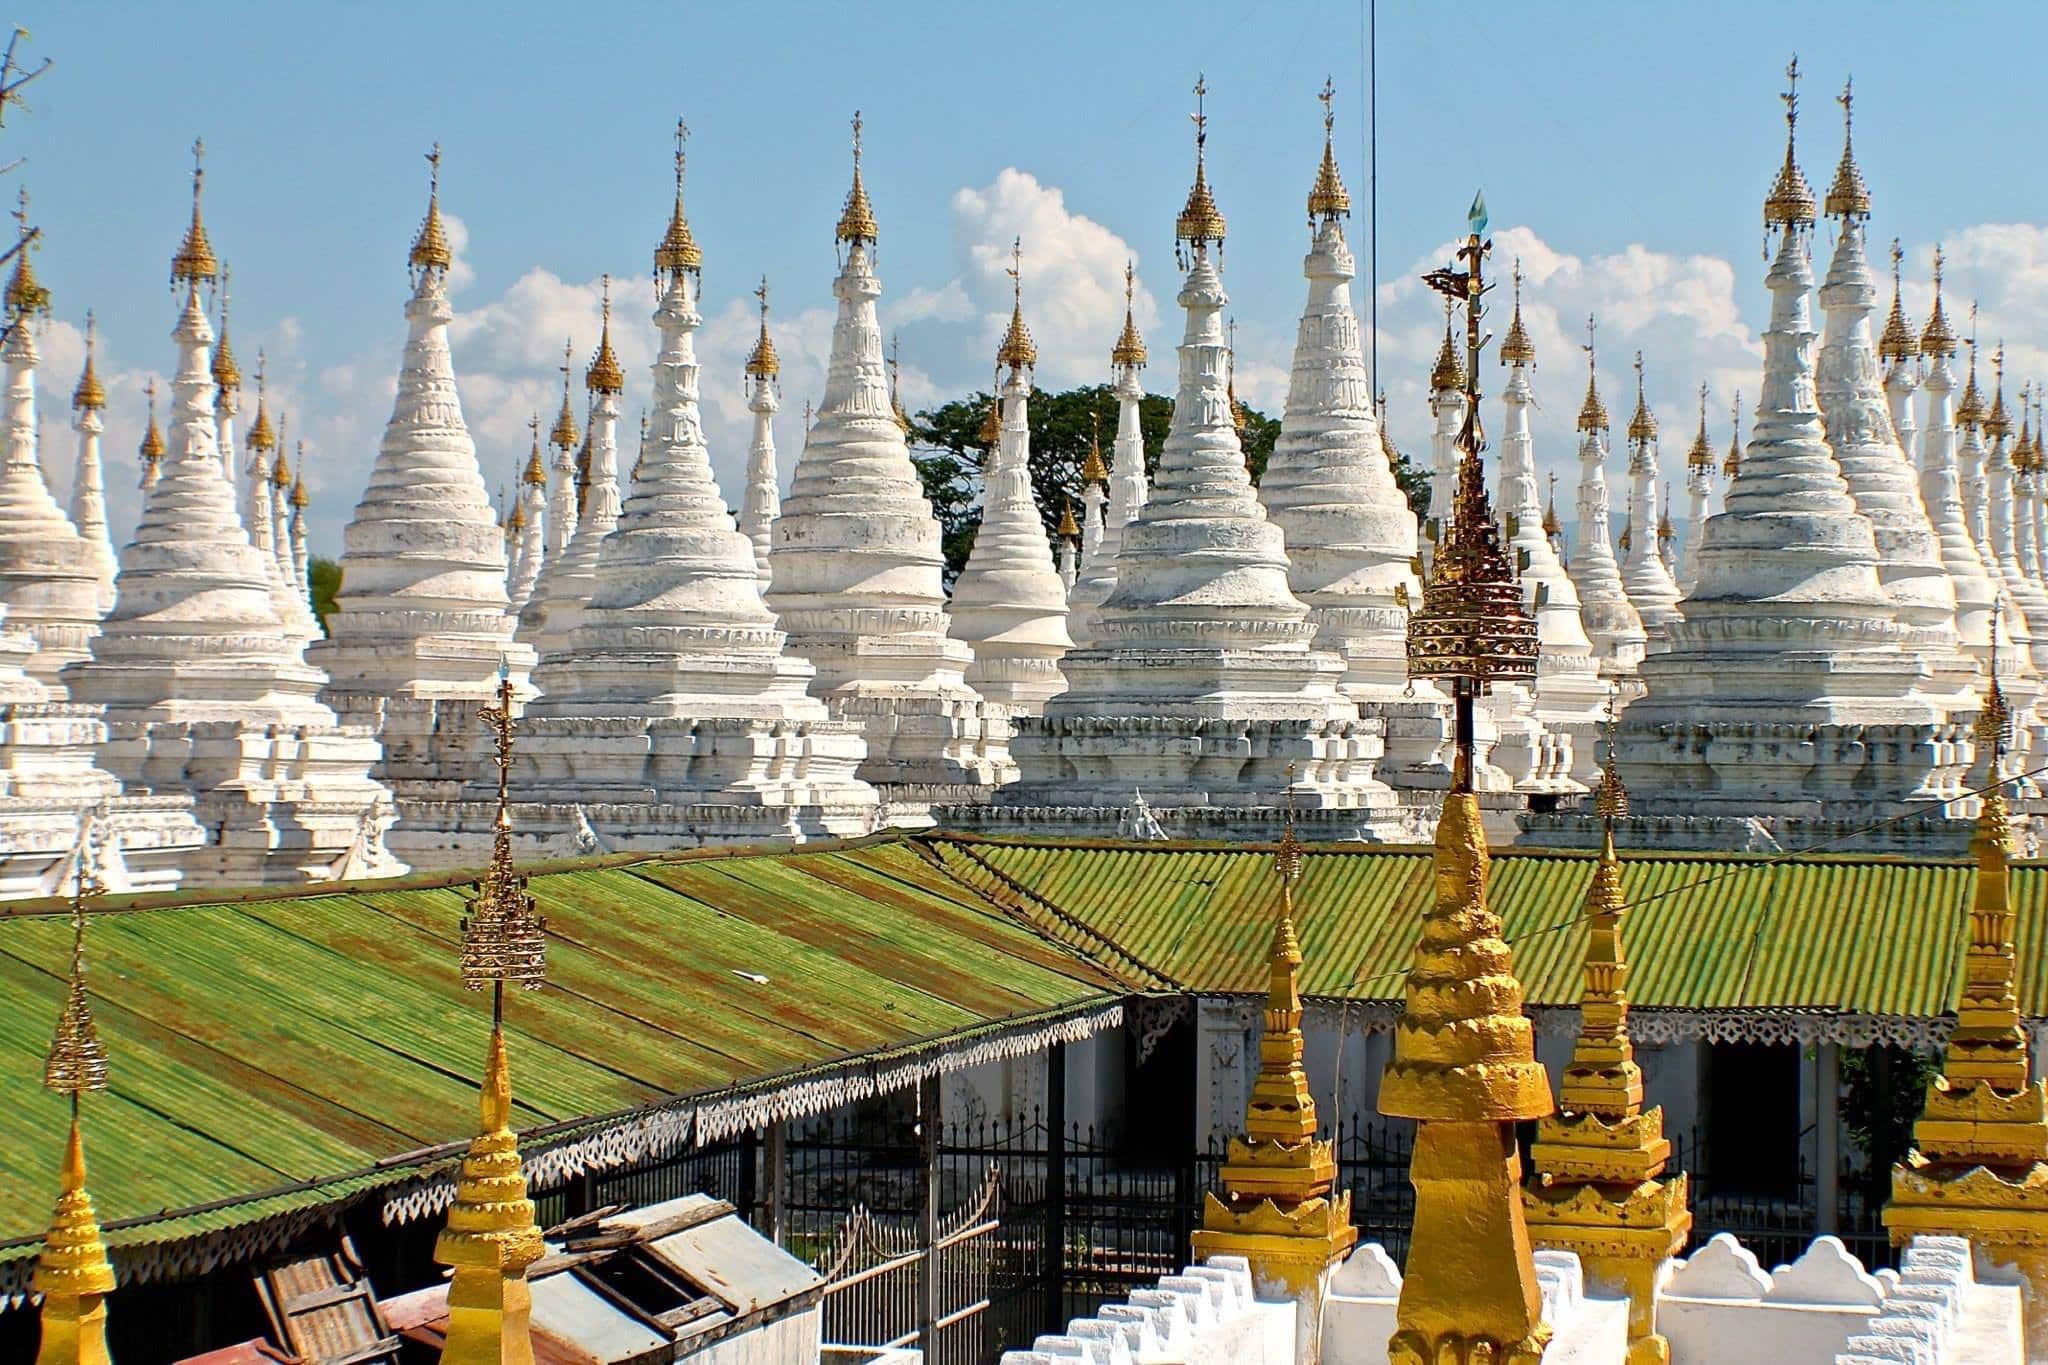 Burma - 51 of 96